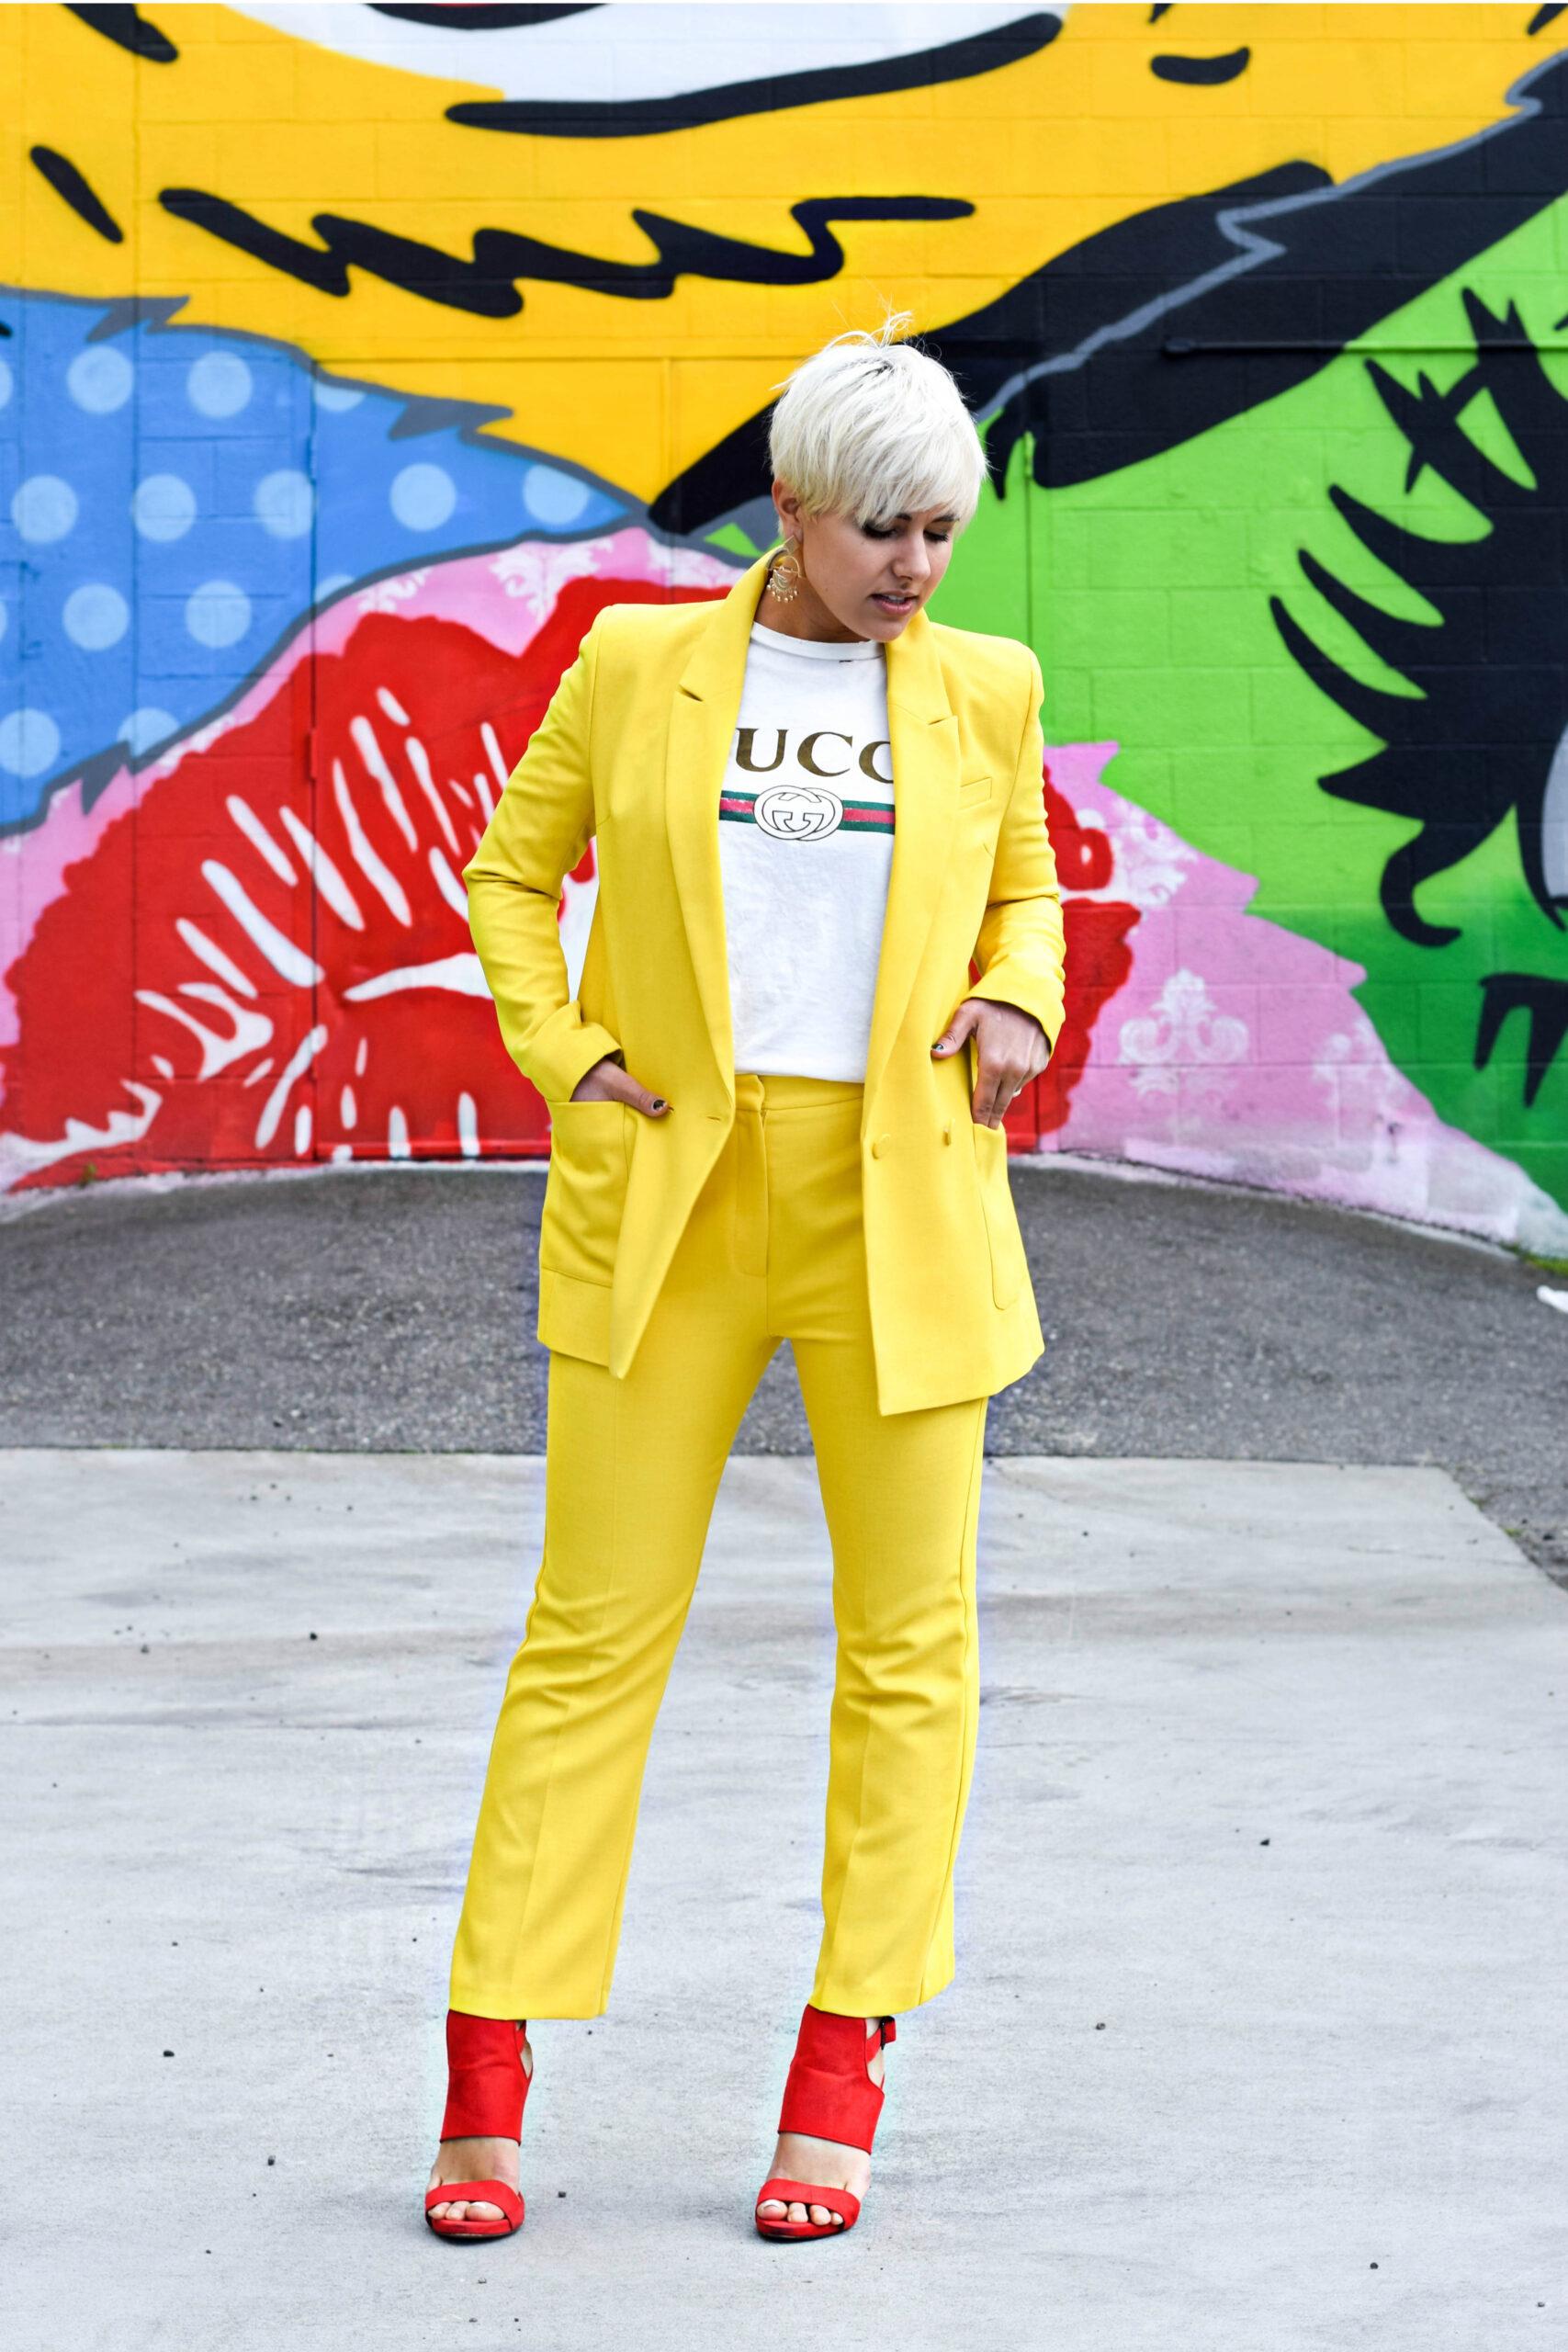 The Gucci Inspired Modern Suit - BloggerNotBillionaire.com